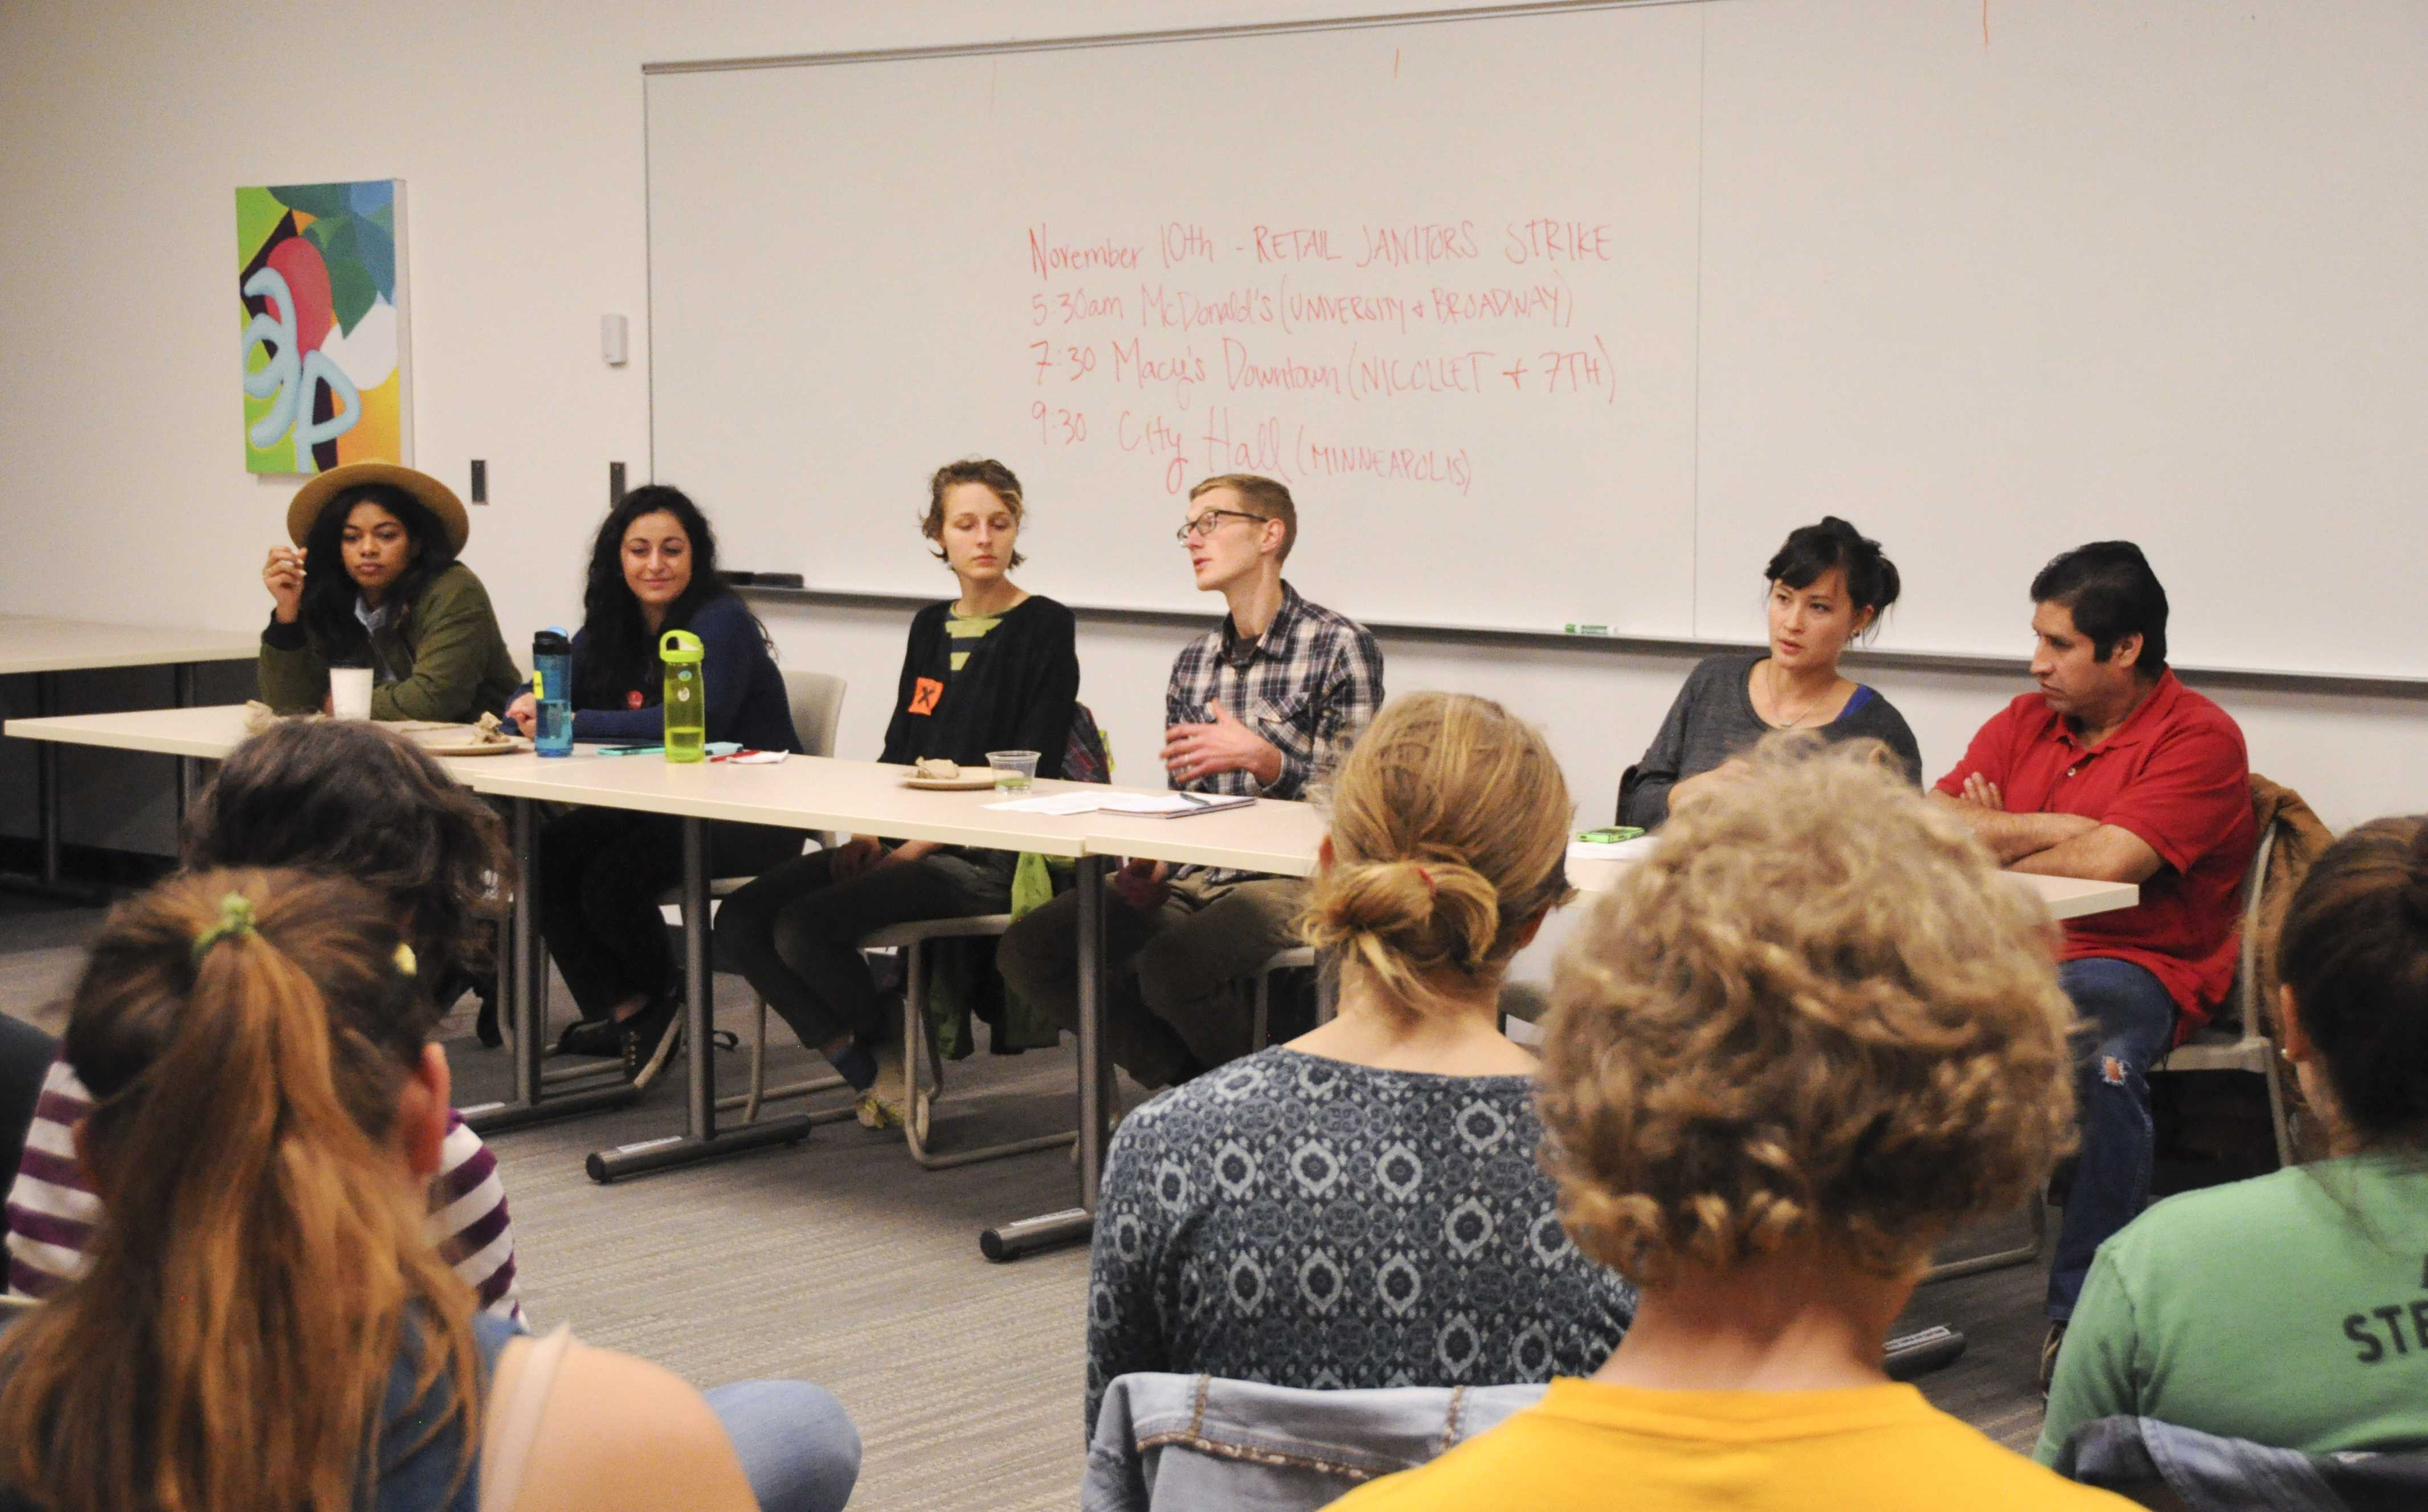 From left to right: Mica Grimm, Mahyan Sorour, Paige Carlson, Erik Kopola, Susan Kikuchi and Pascual Tapia